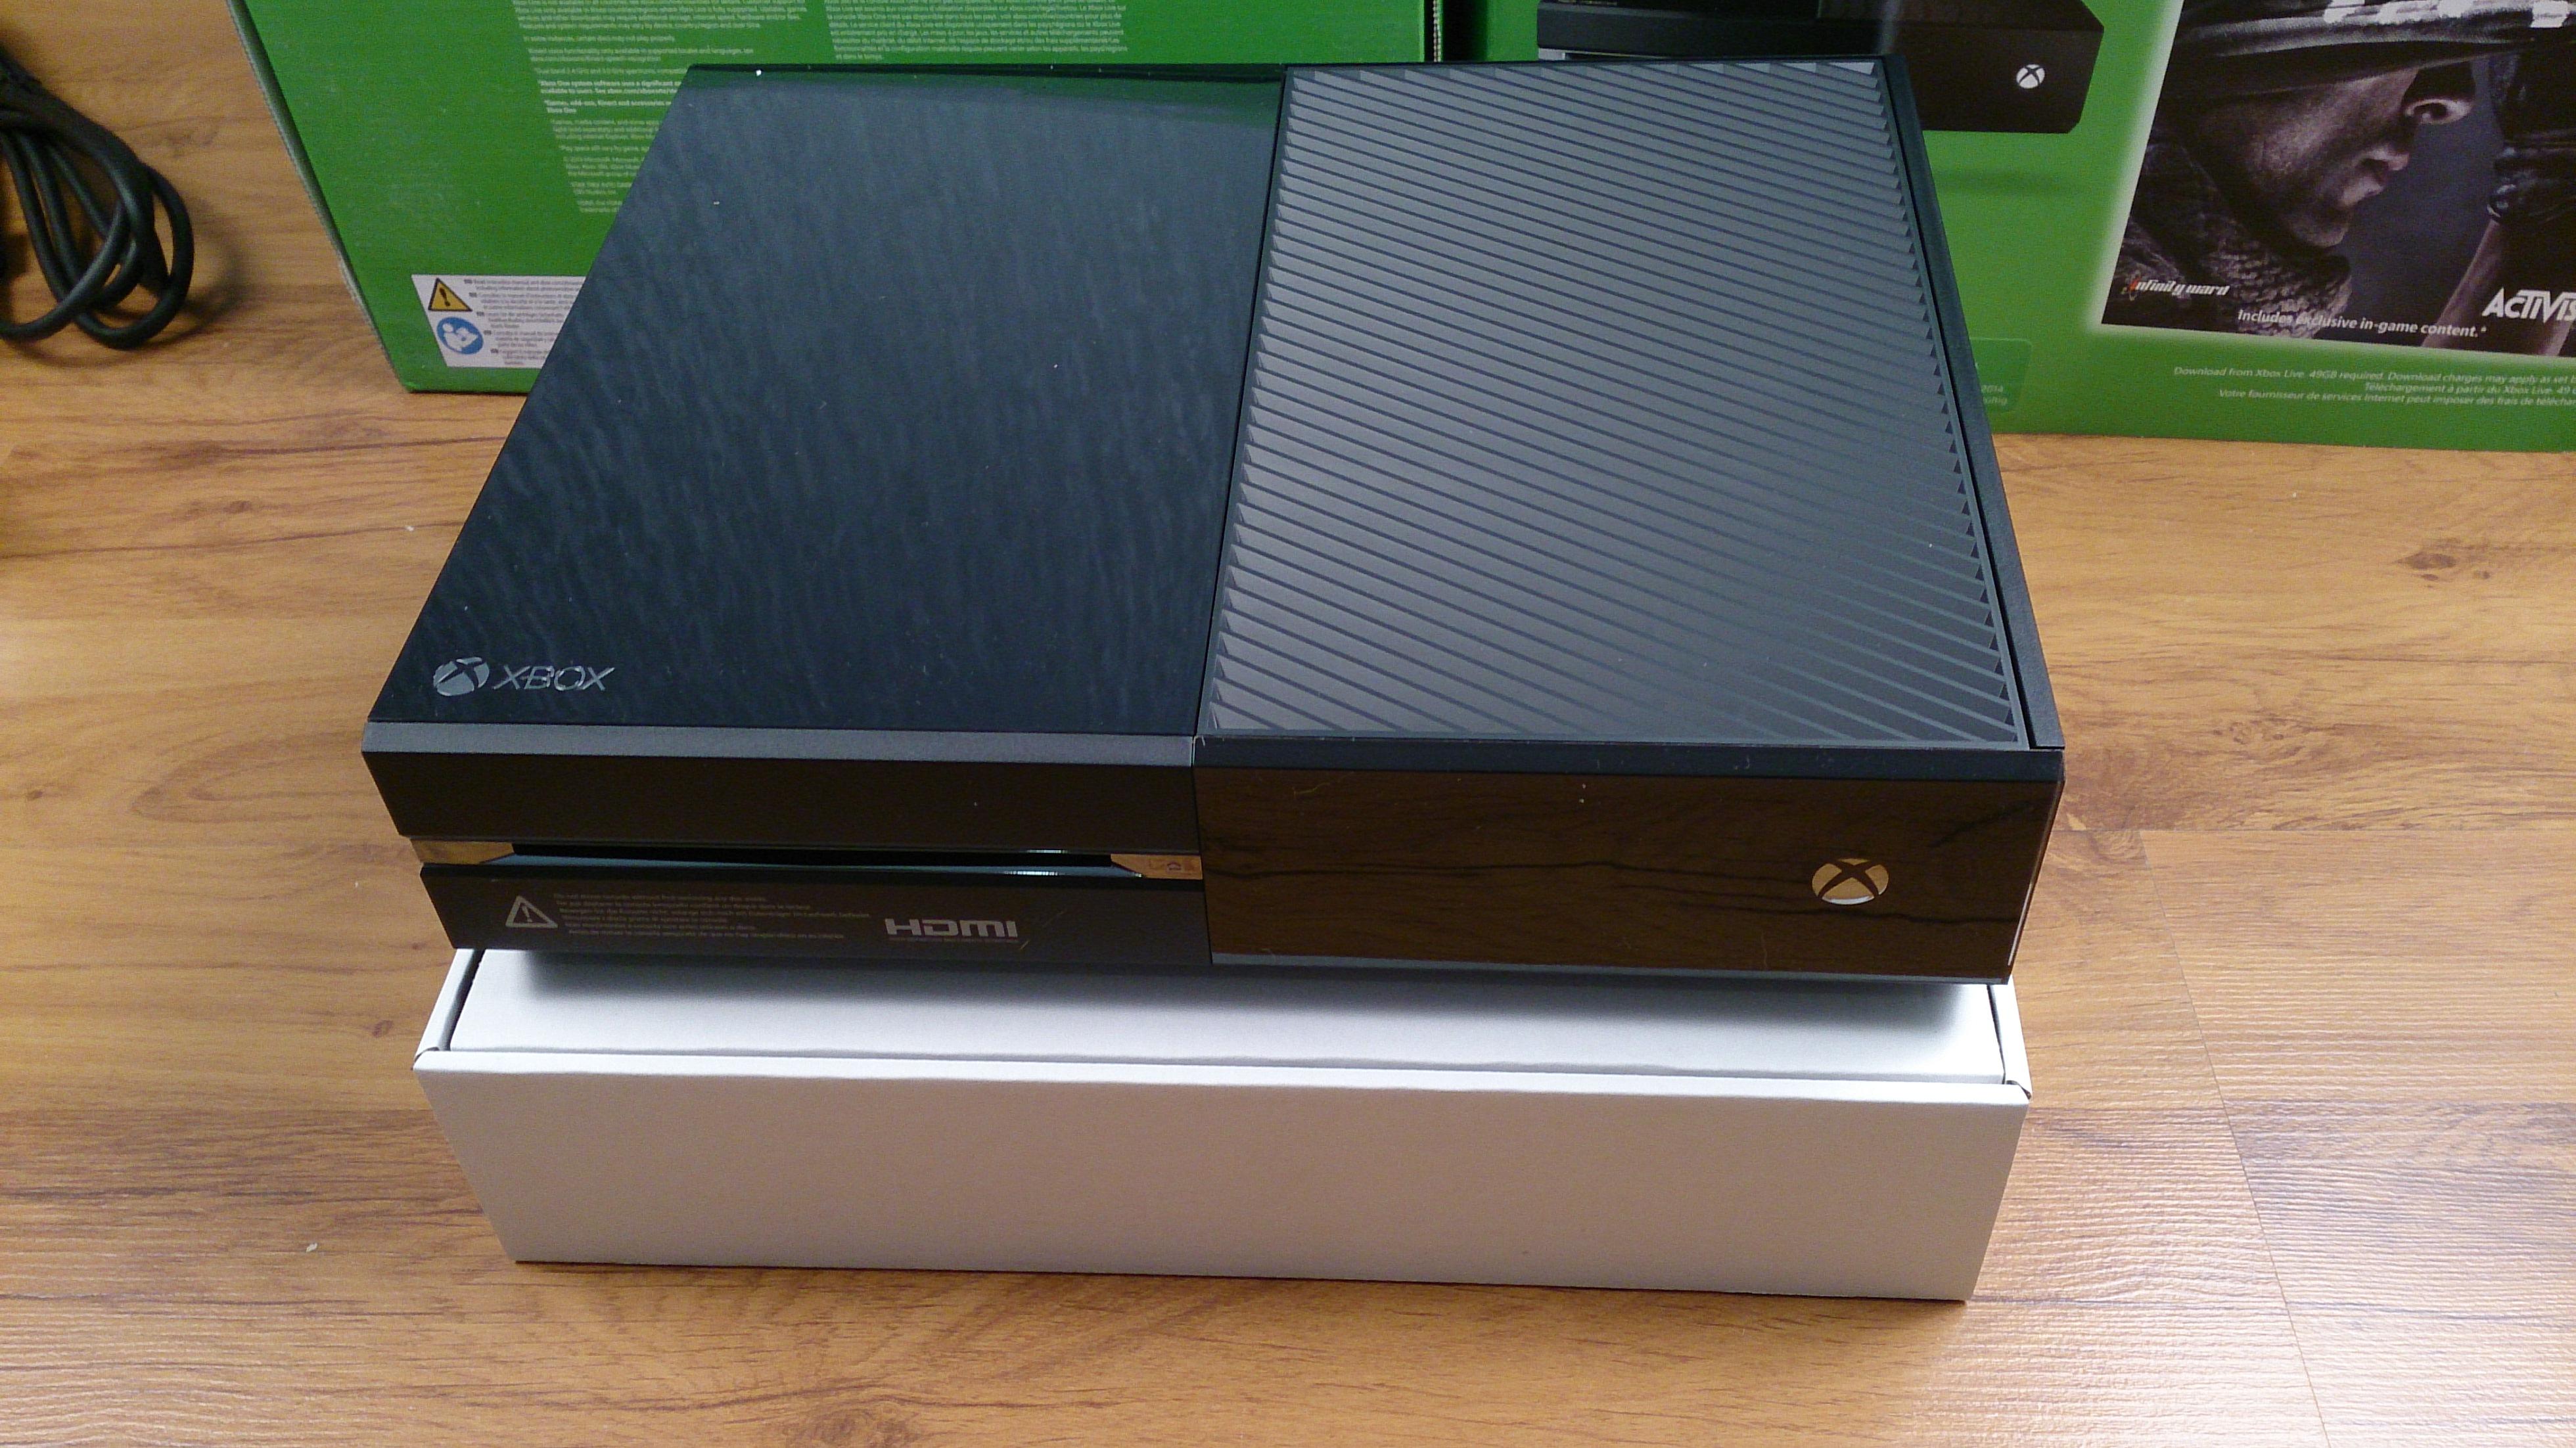 Xbox One: The Successor To Xbox 360